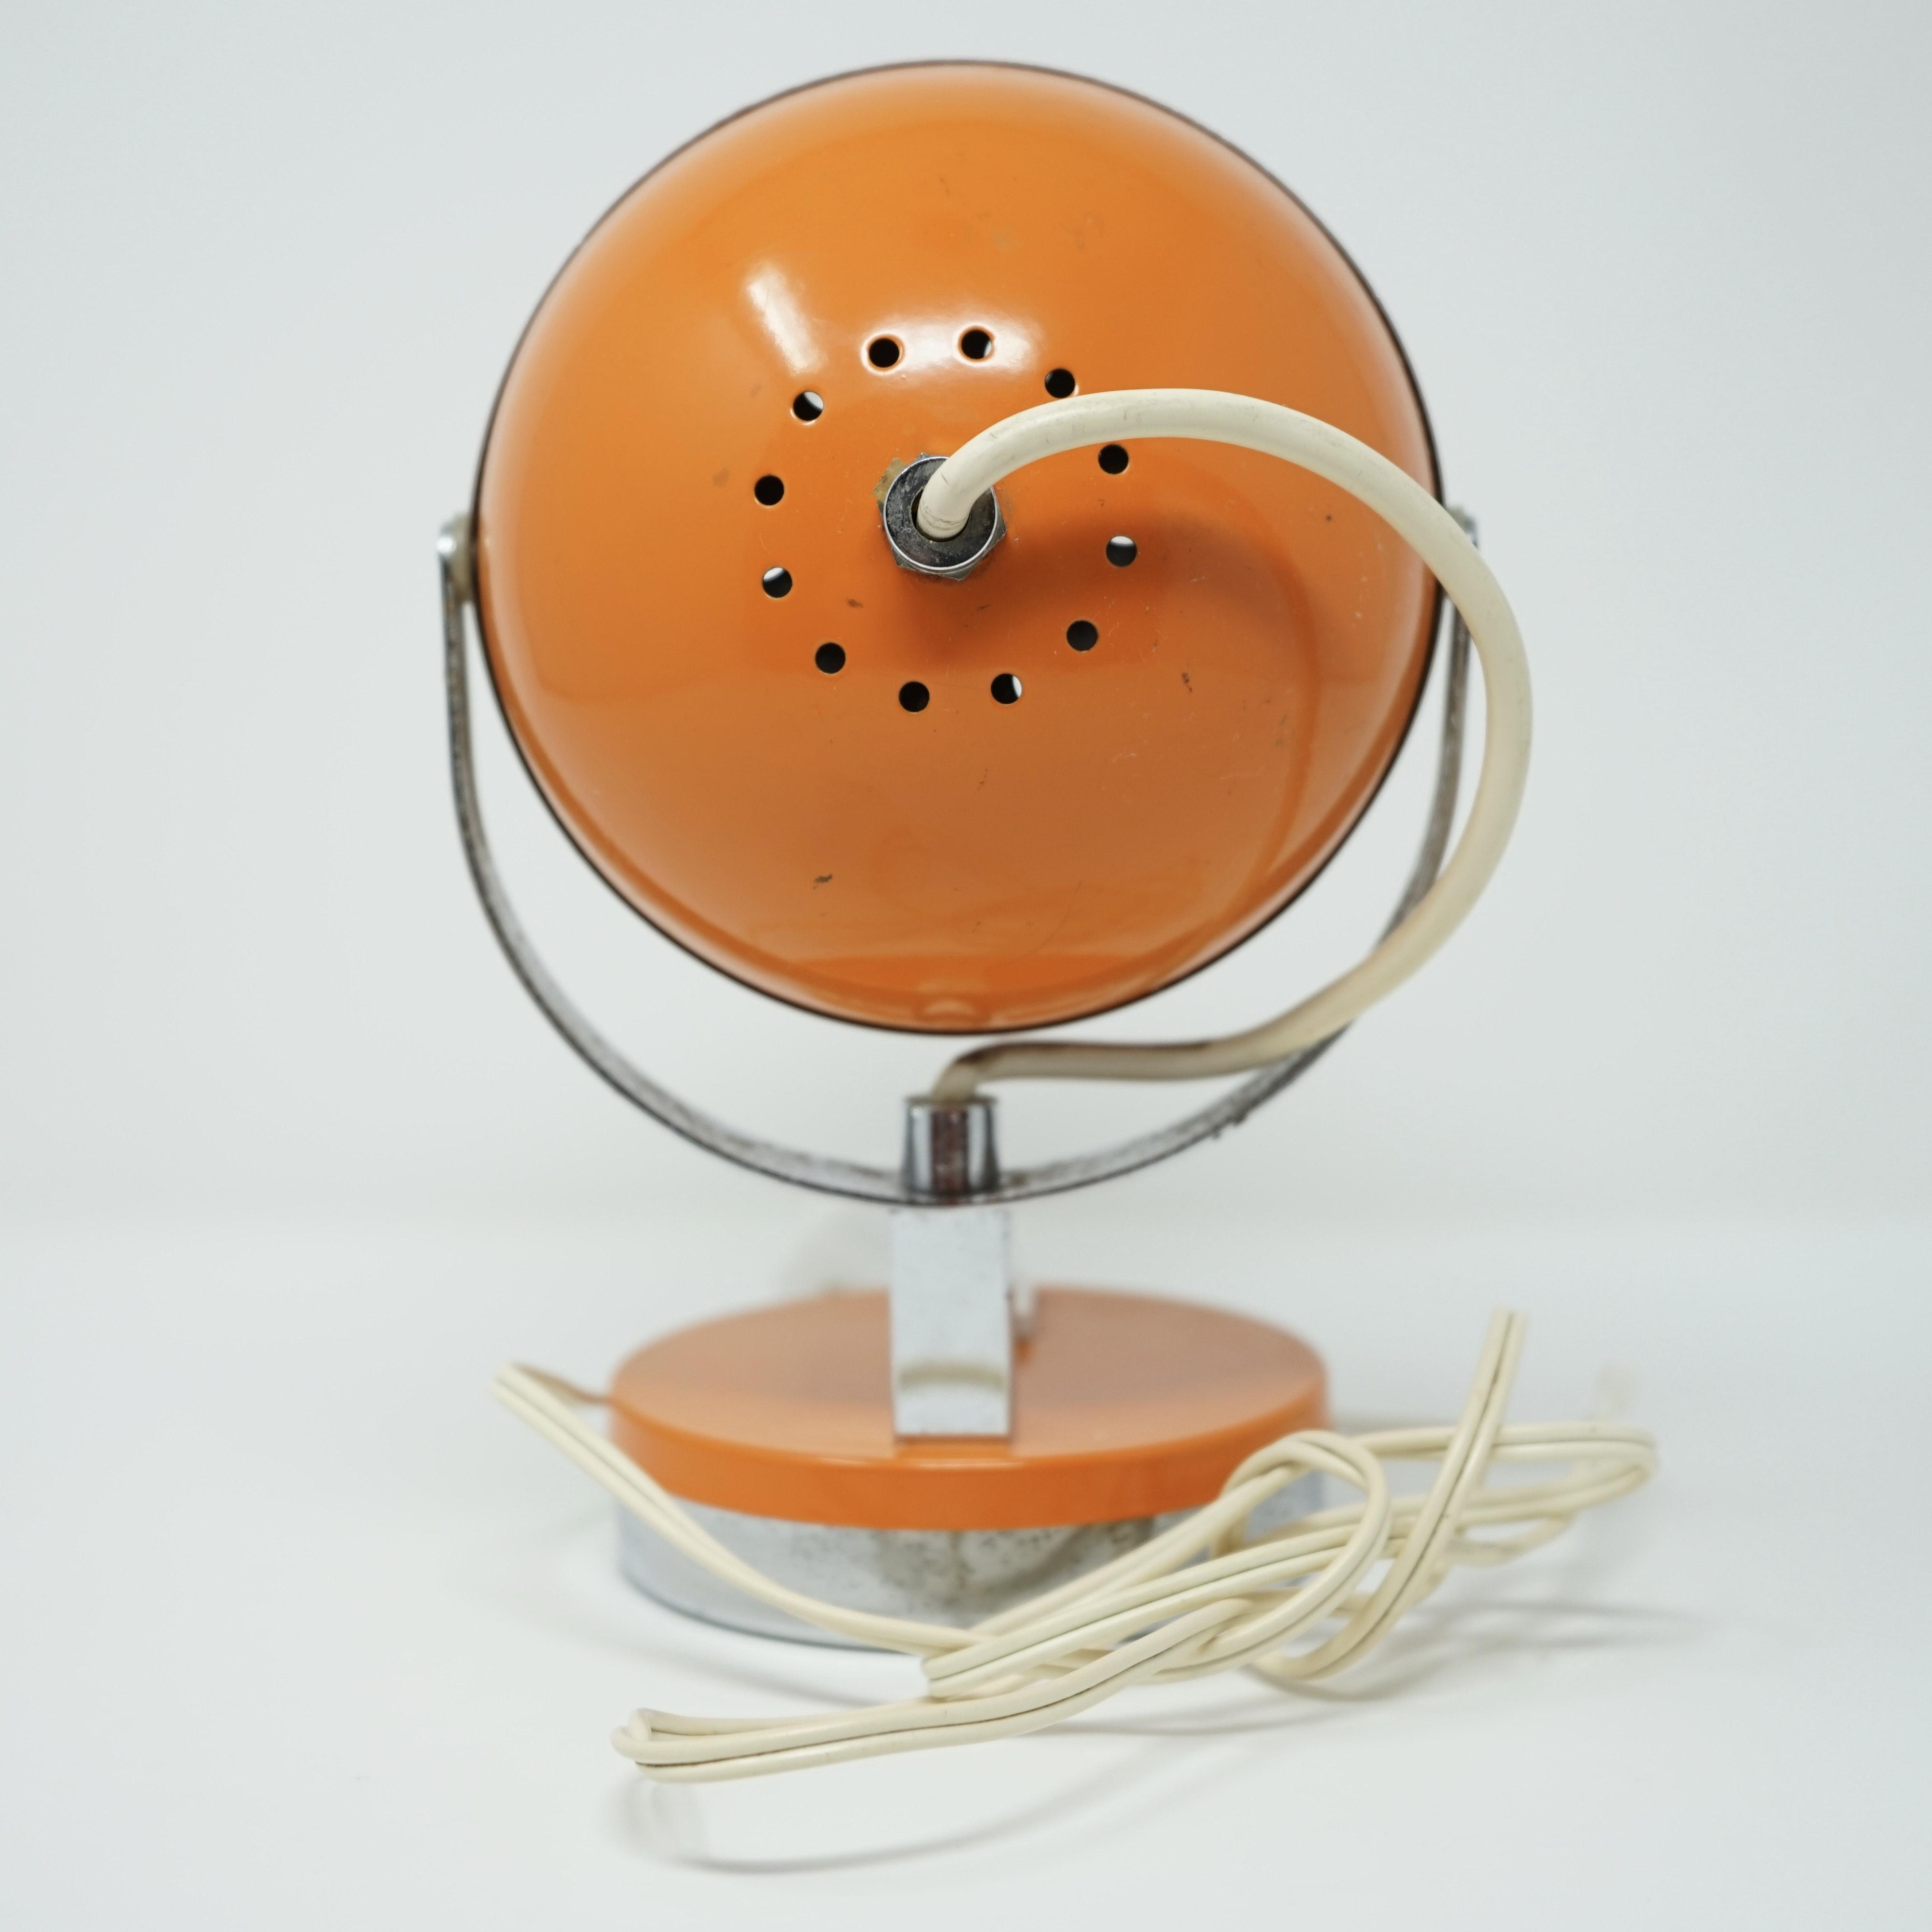 Lampe Eyeball Orange Années 70 Arrière